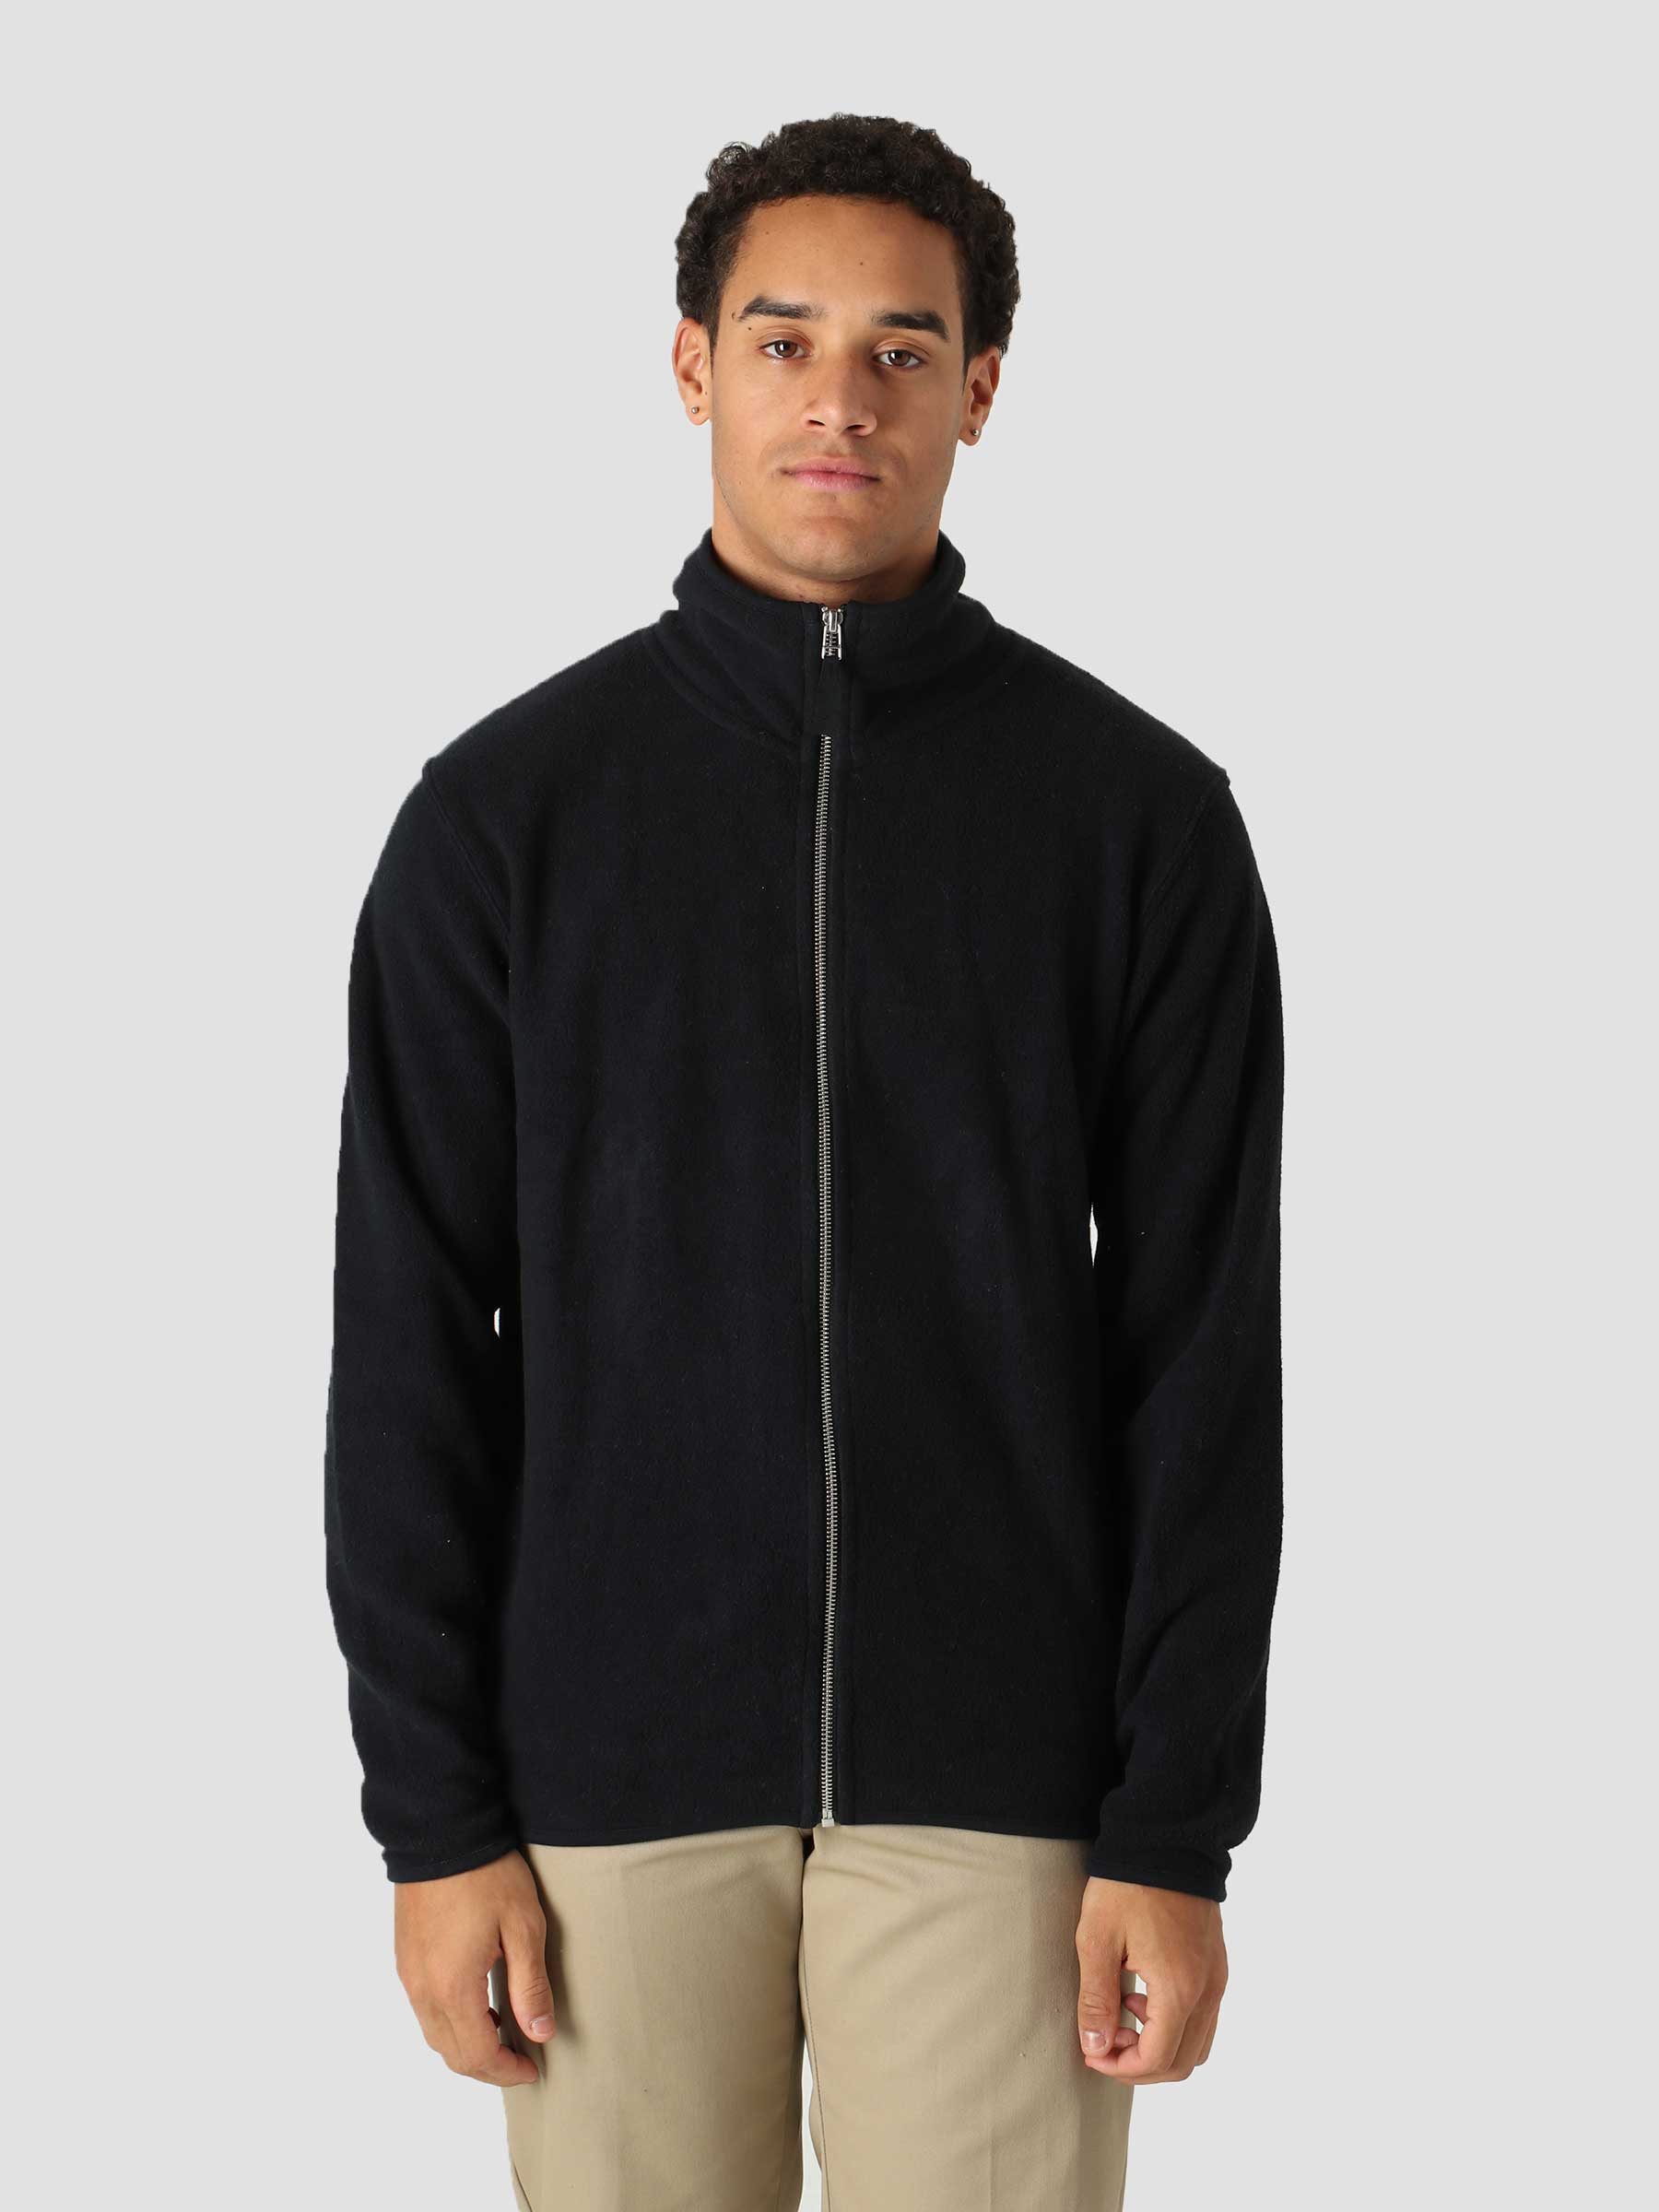 QB97 Full Zip Track Fleece Black